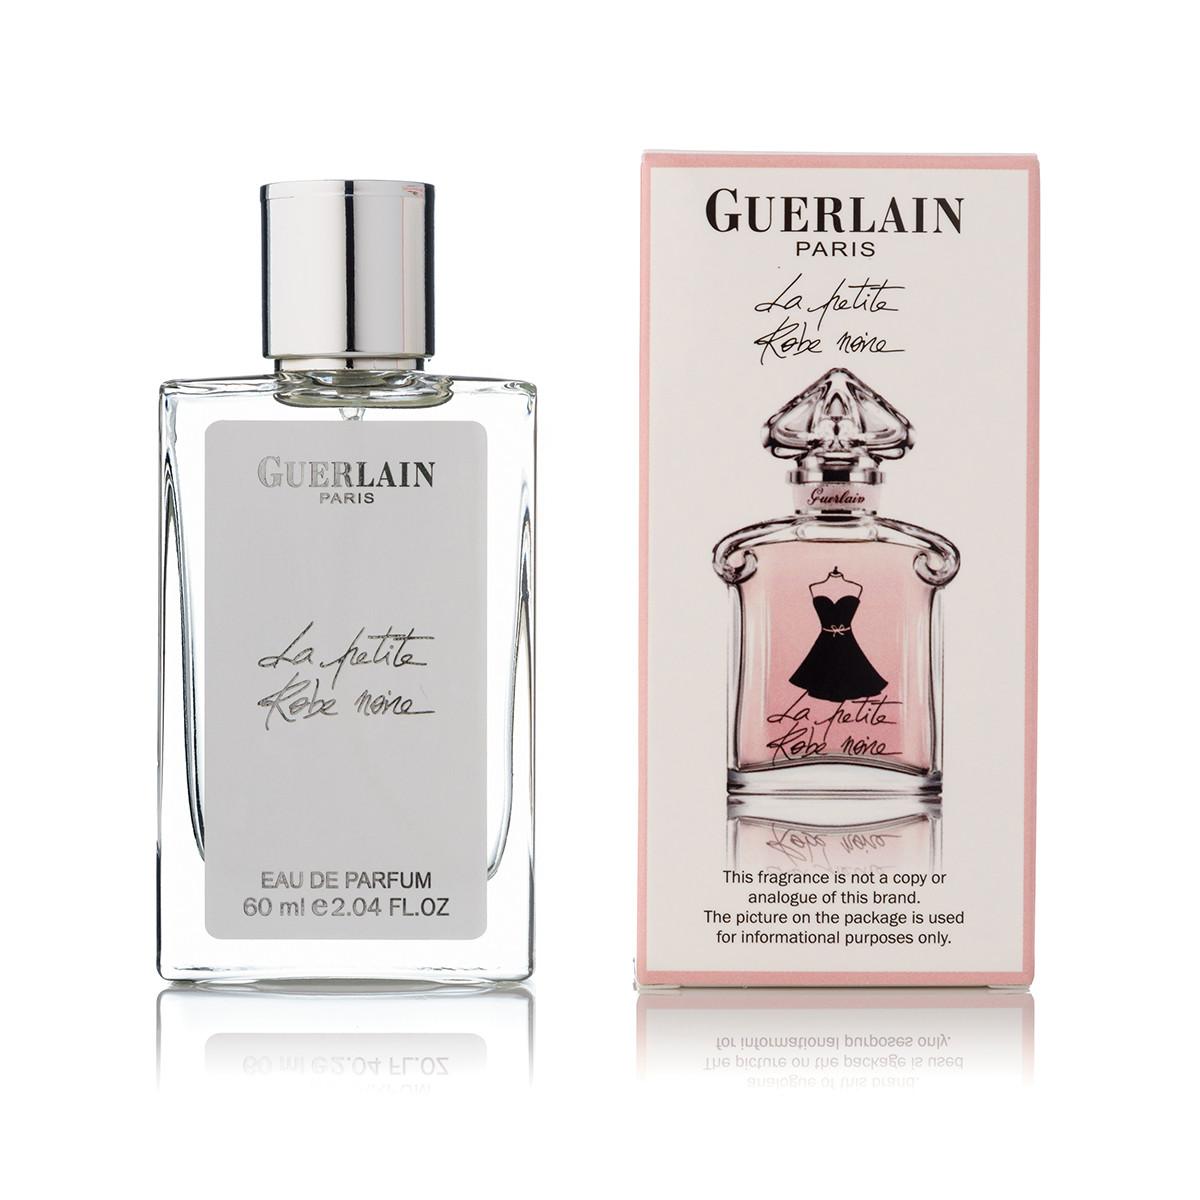 Мини - парфюм 60 мл для женщин La Petite Robe Noir